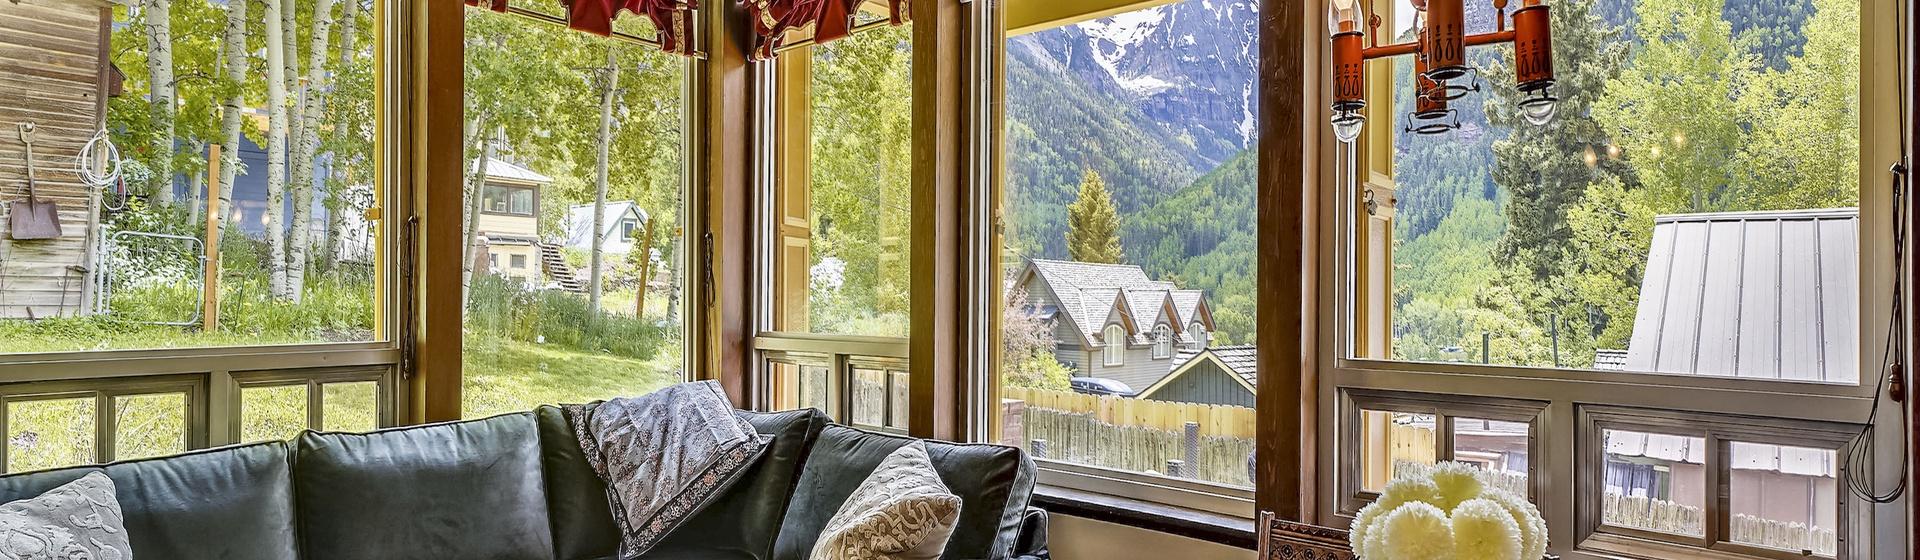 2.03-telluride-summer-haus-living-room-dining-view-web.jpg